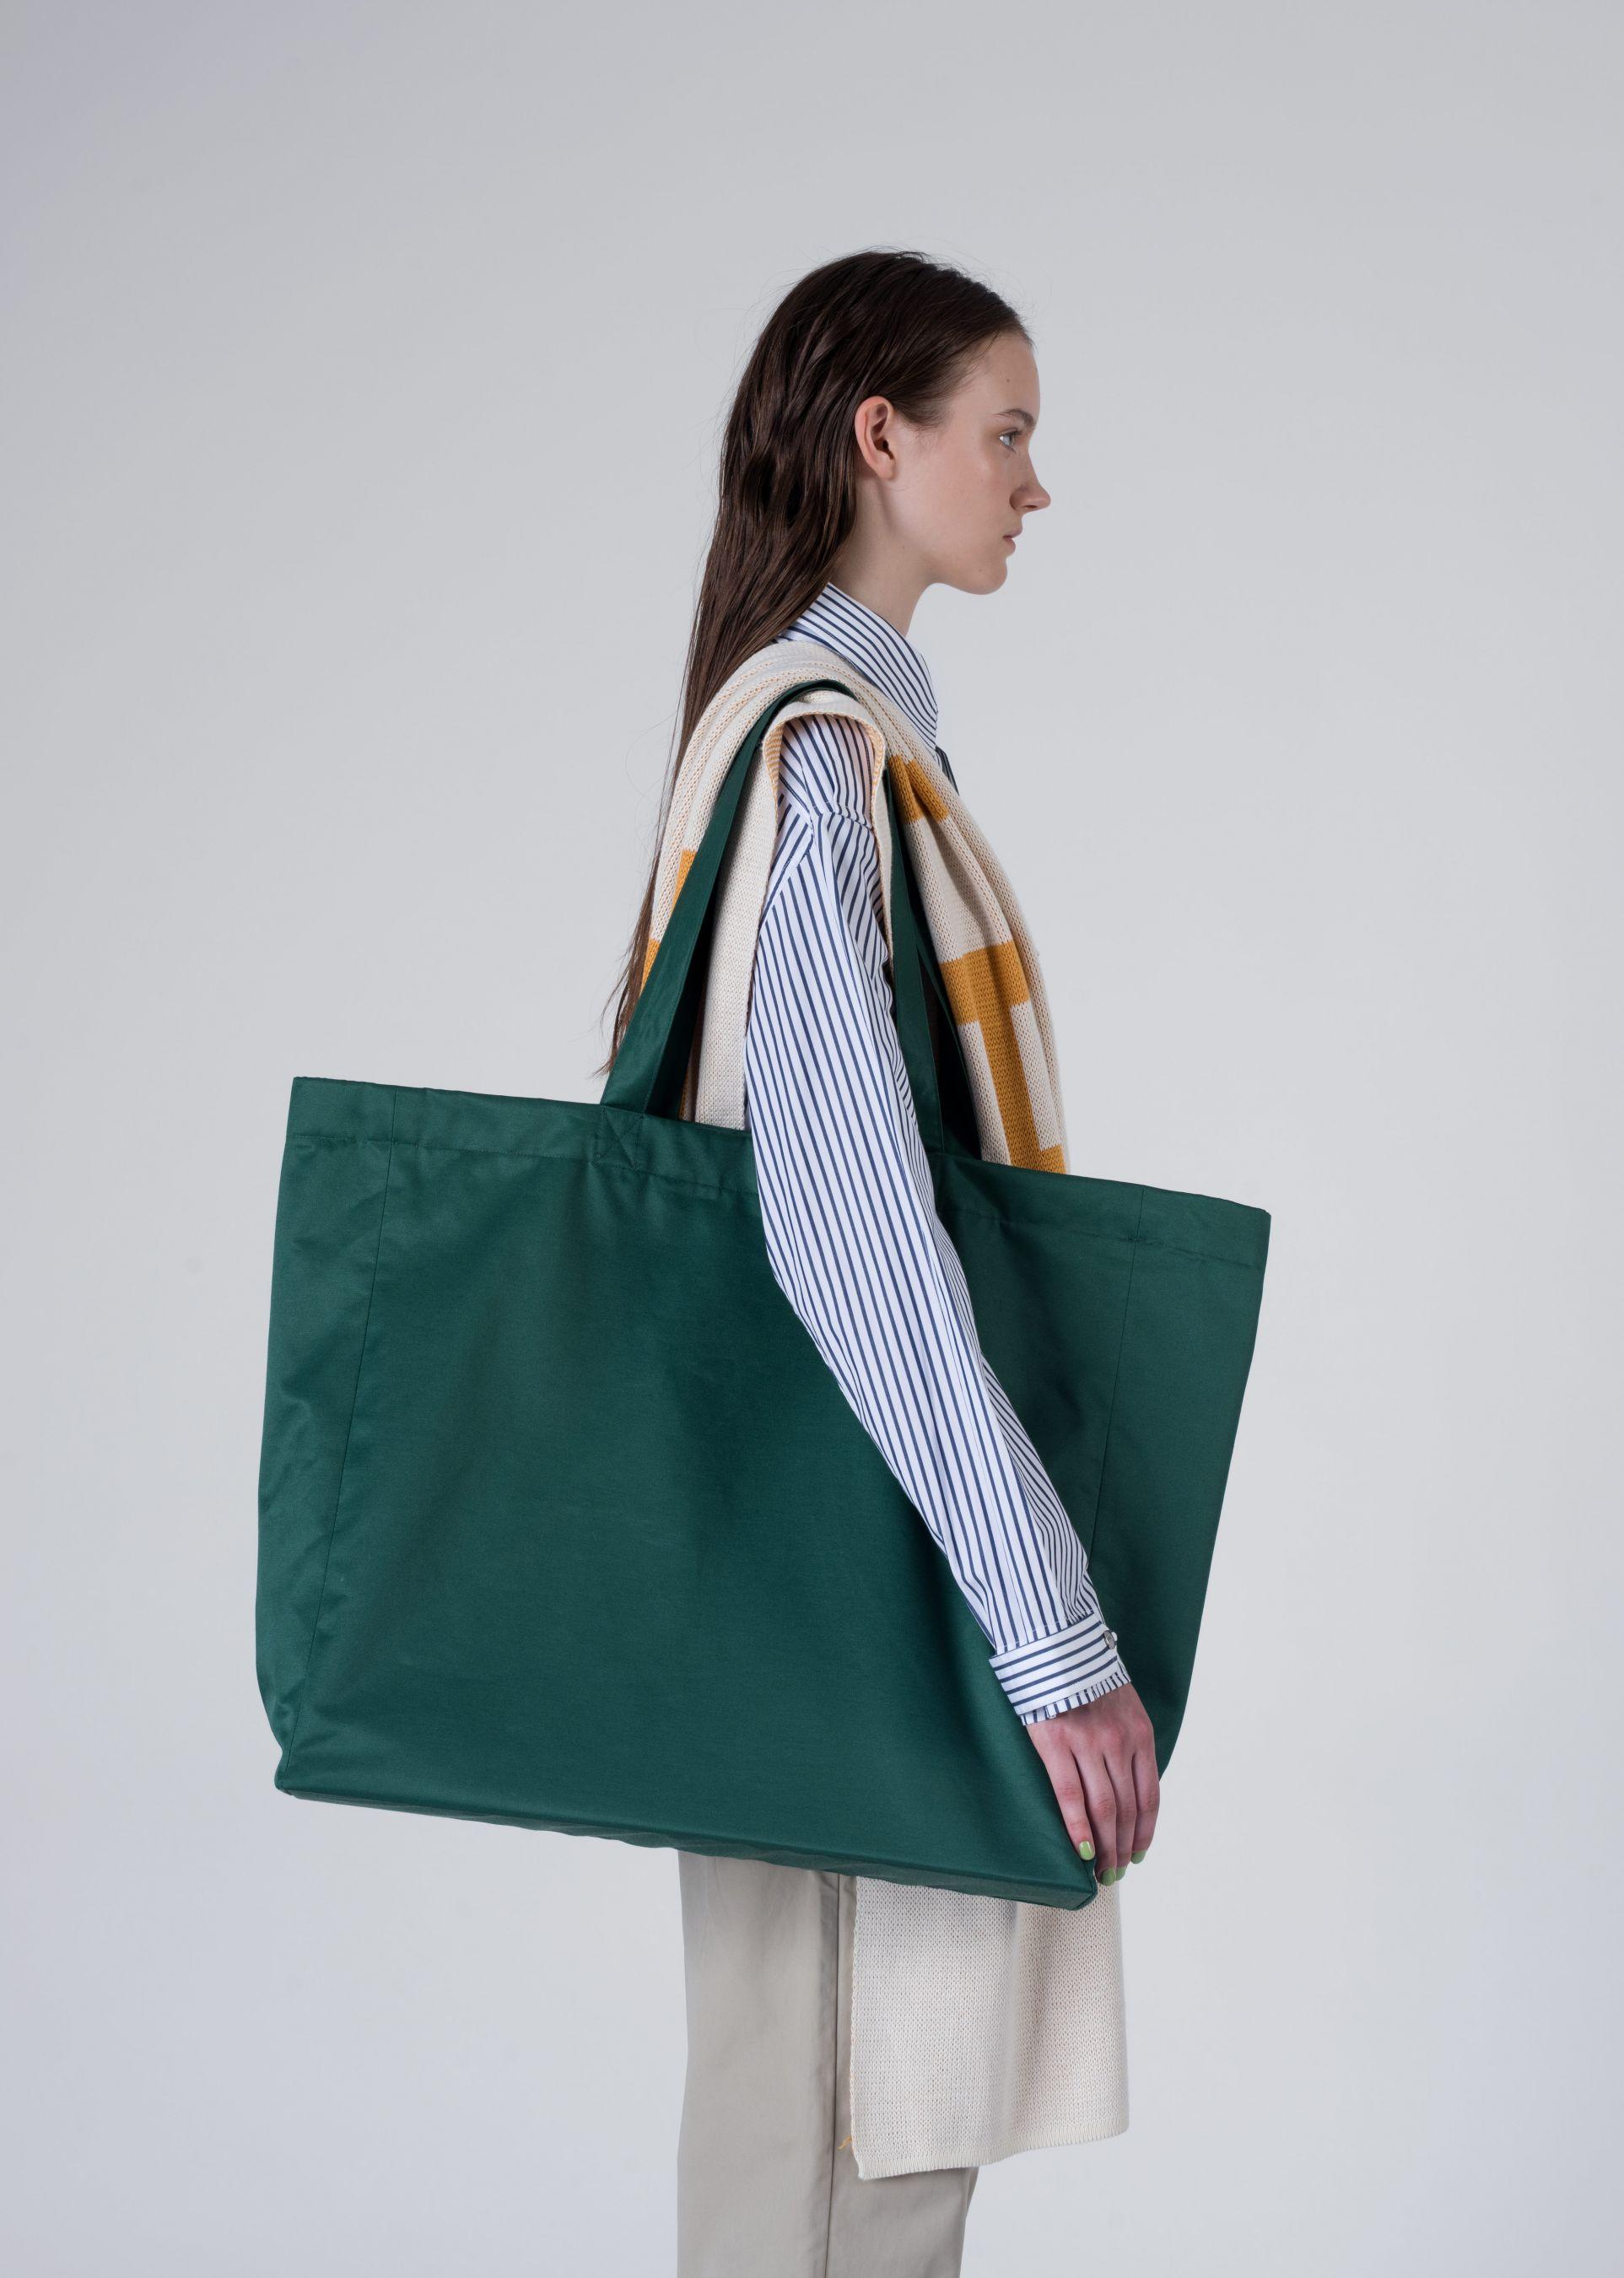 HEY BAG GREEN